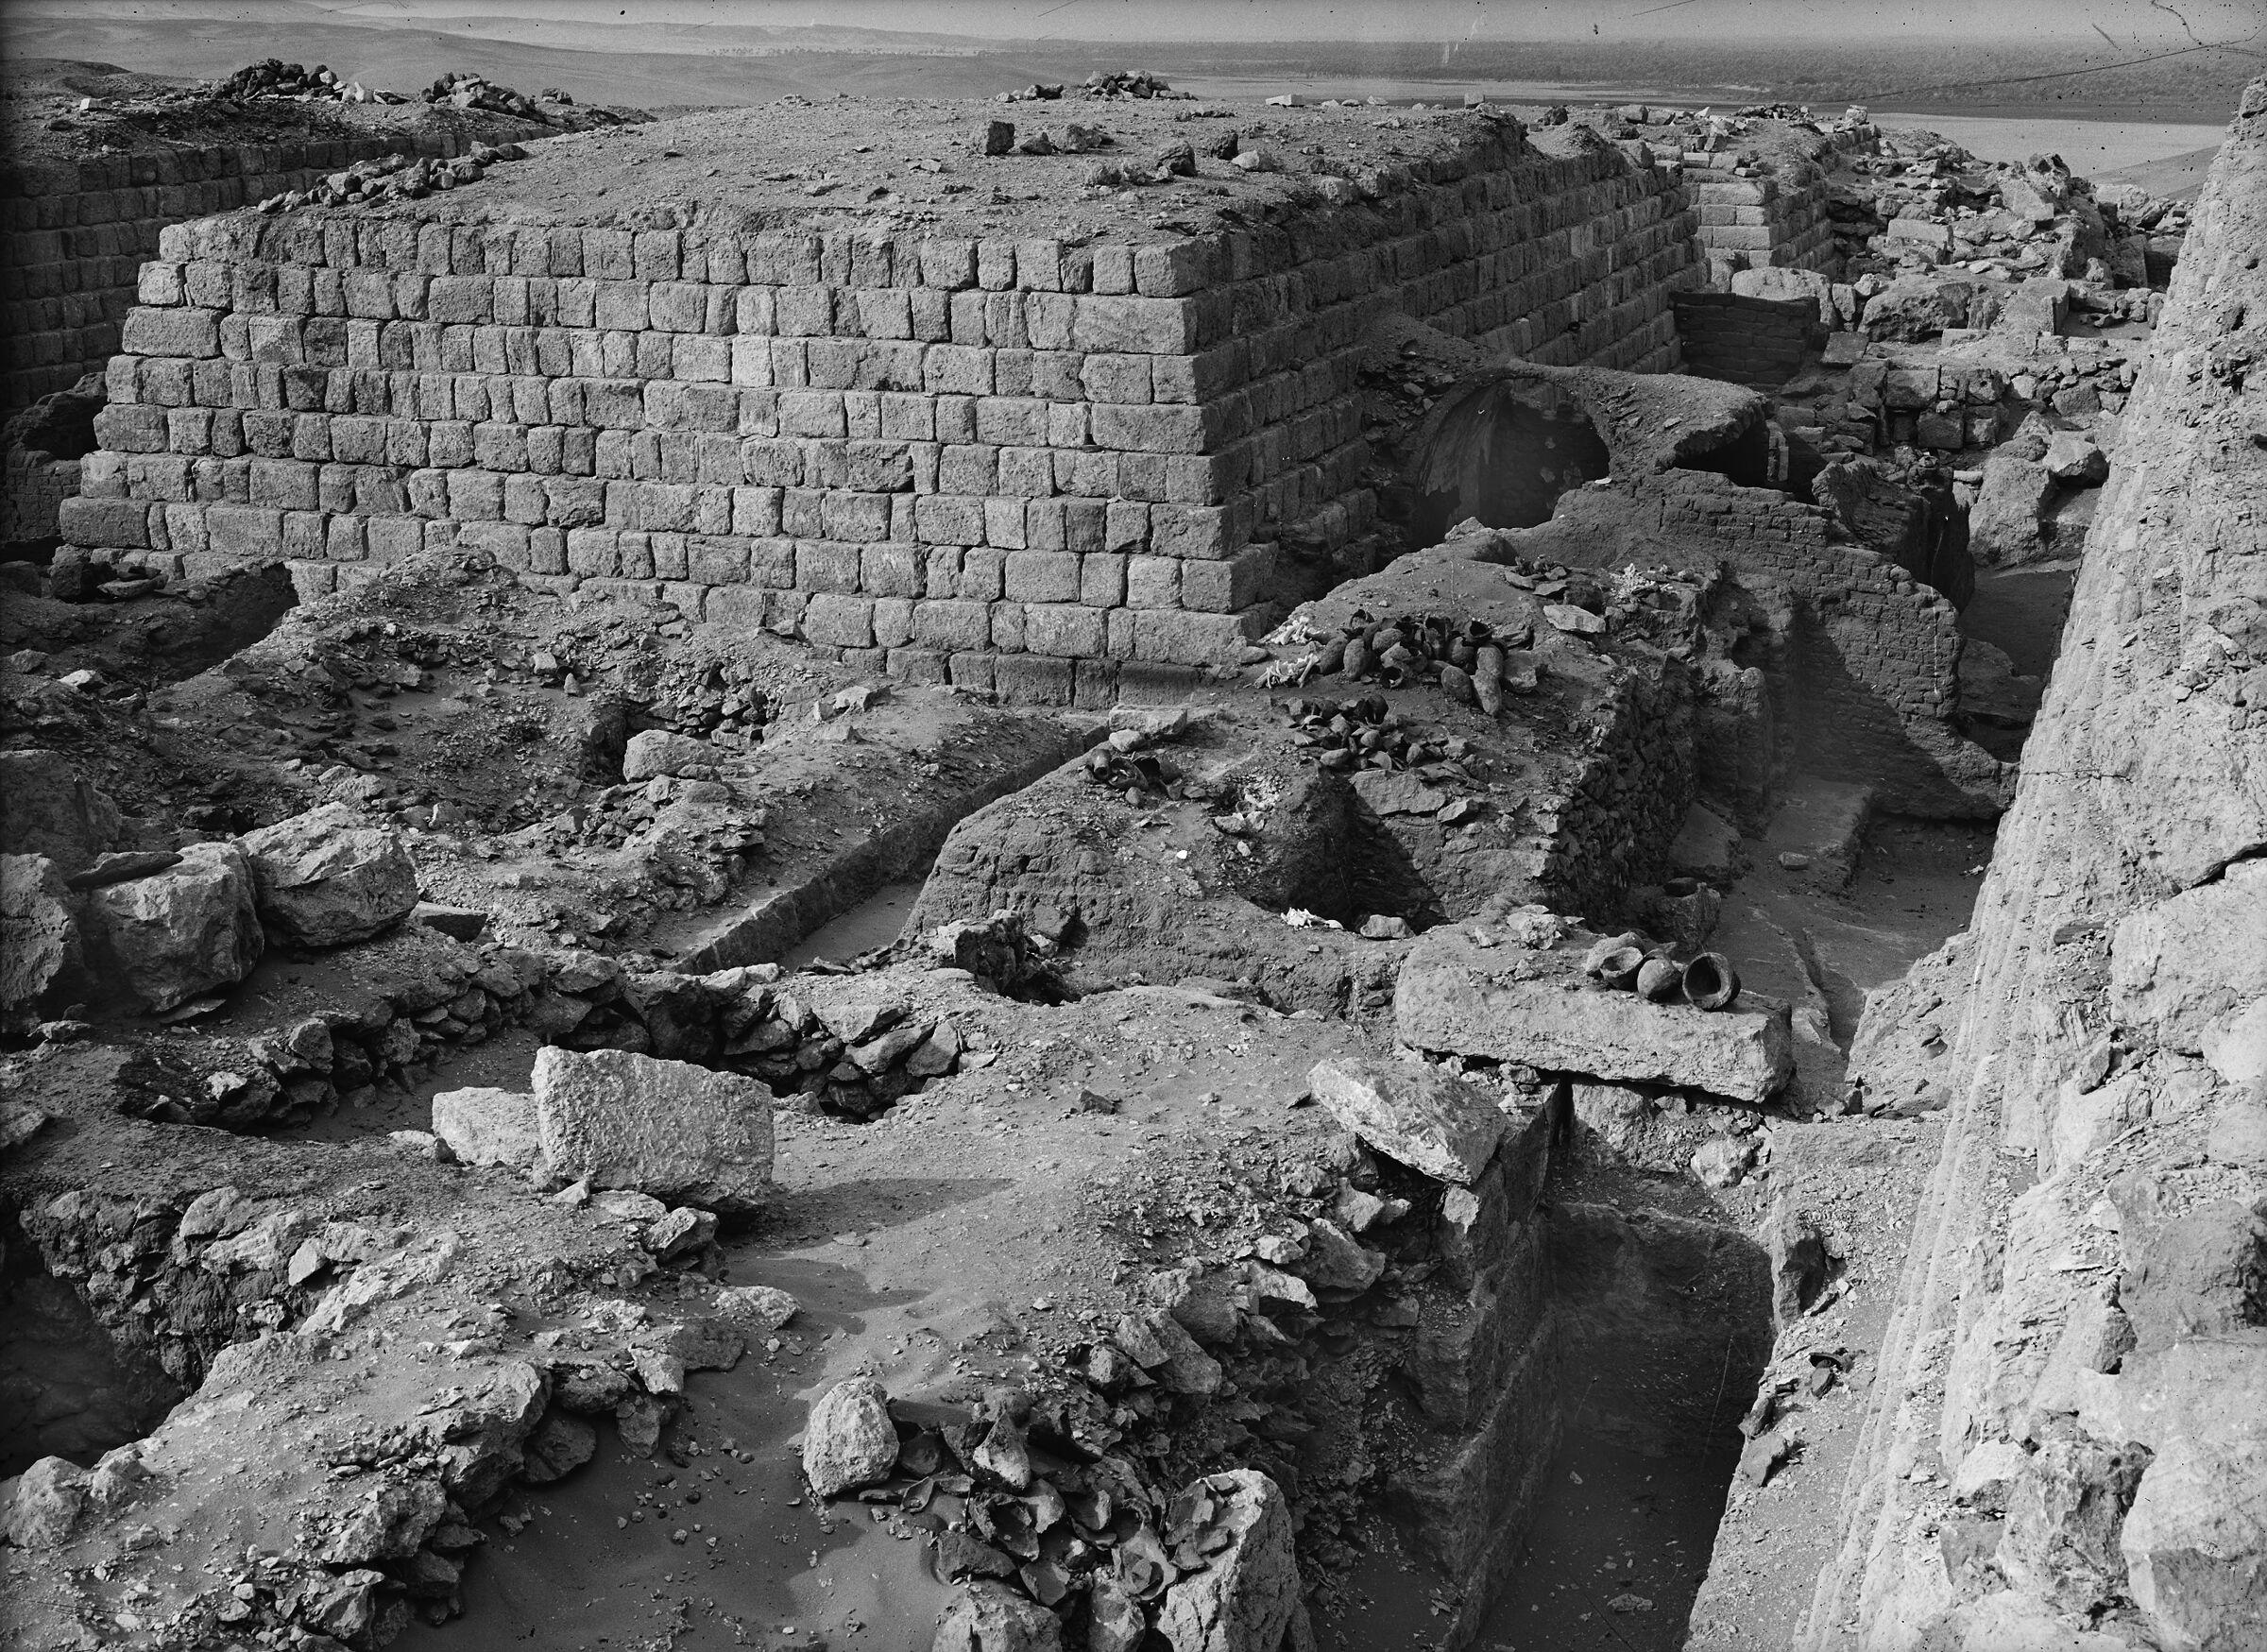 Western Cemetery: Site: Giza; View: G 1363, G 1364, G 1365, G 1366, G 1360, G 1203